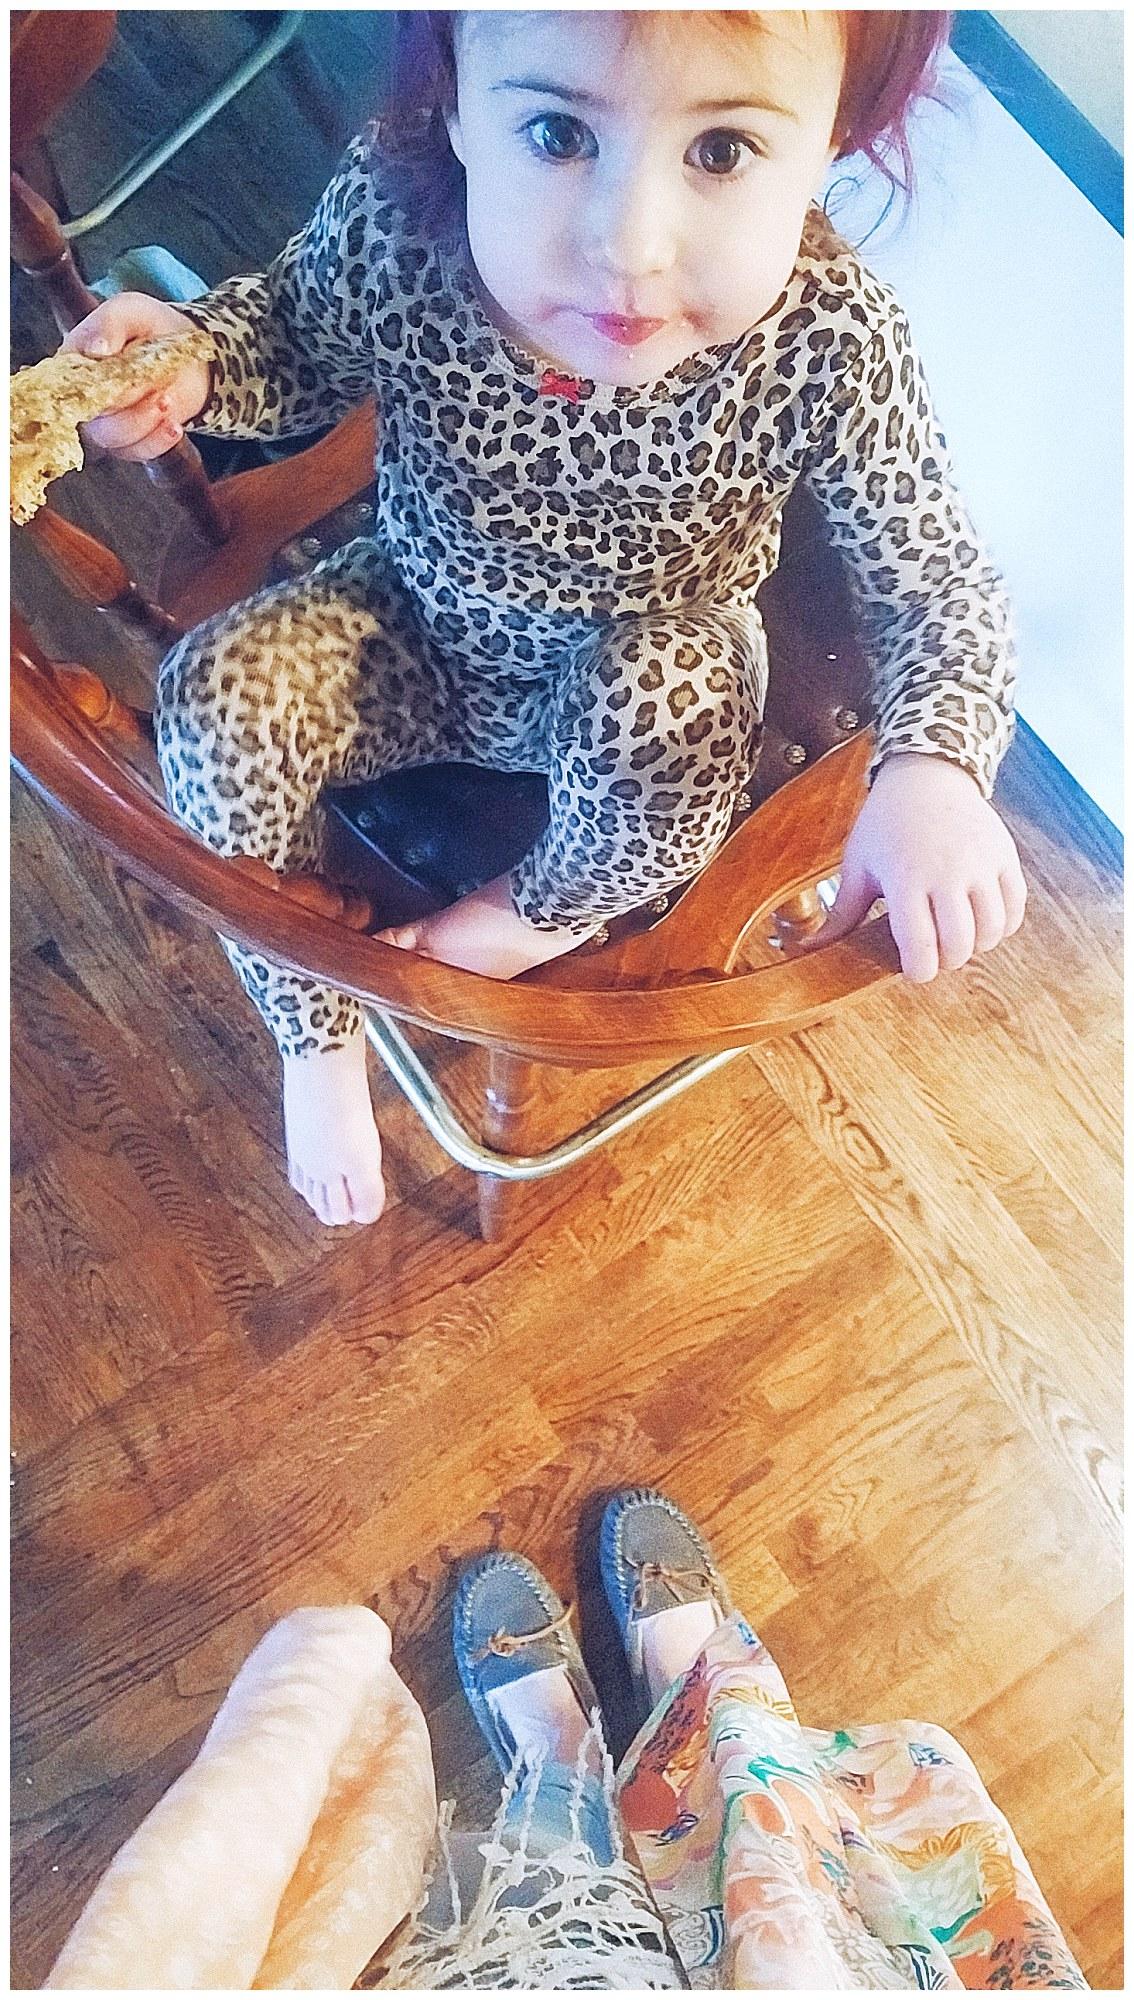 cha wilde - parenting - cheetah print - roaring like tigers - music seattle - singer-songwriter